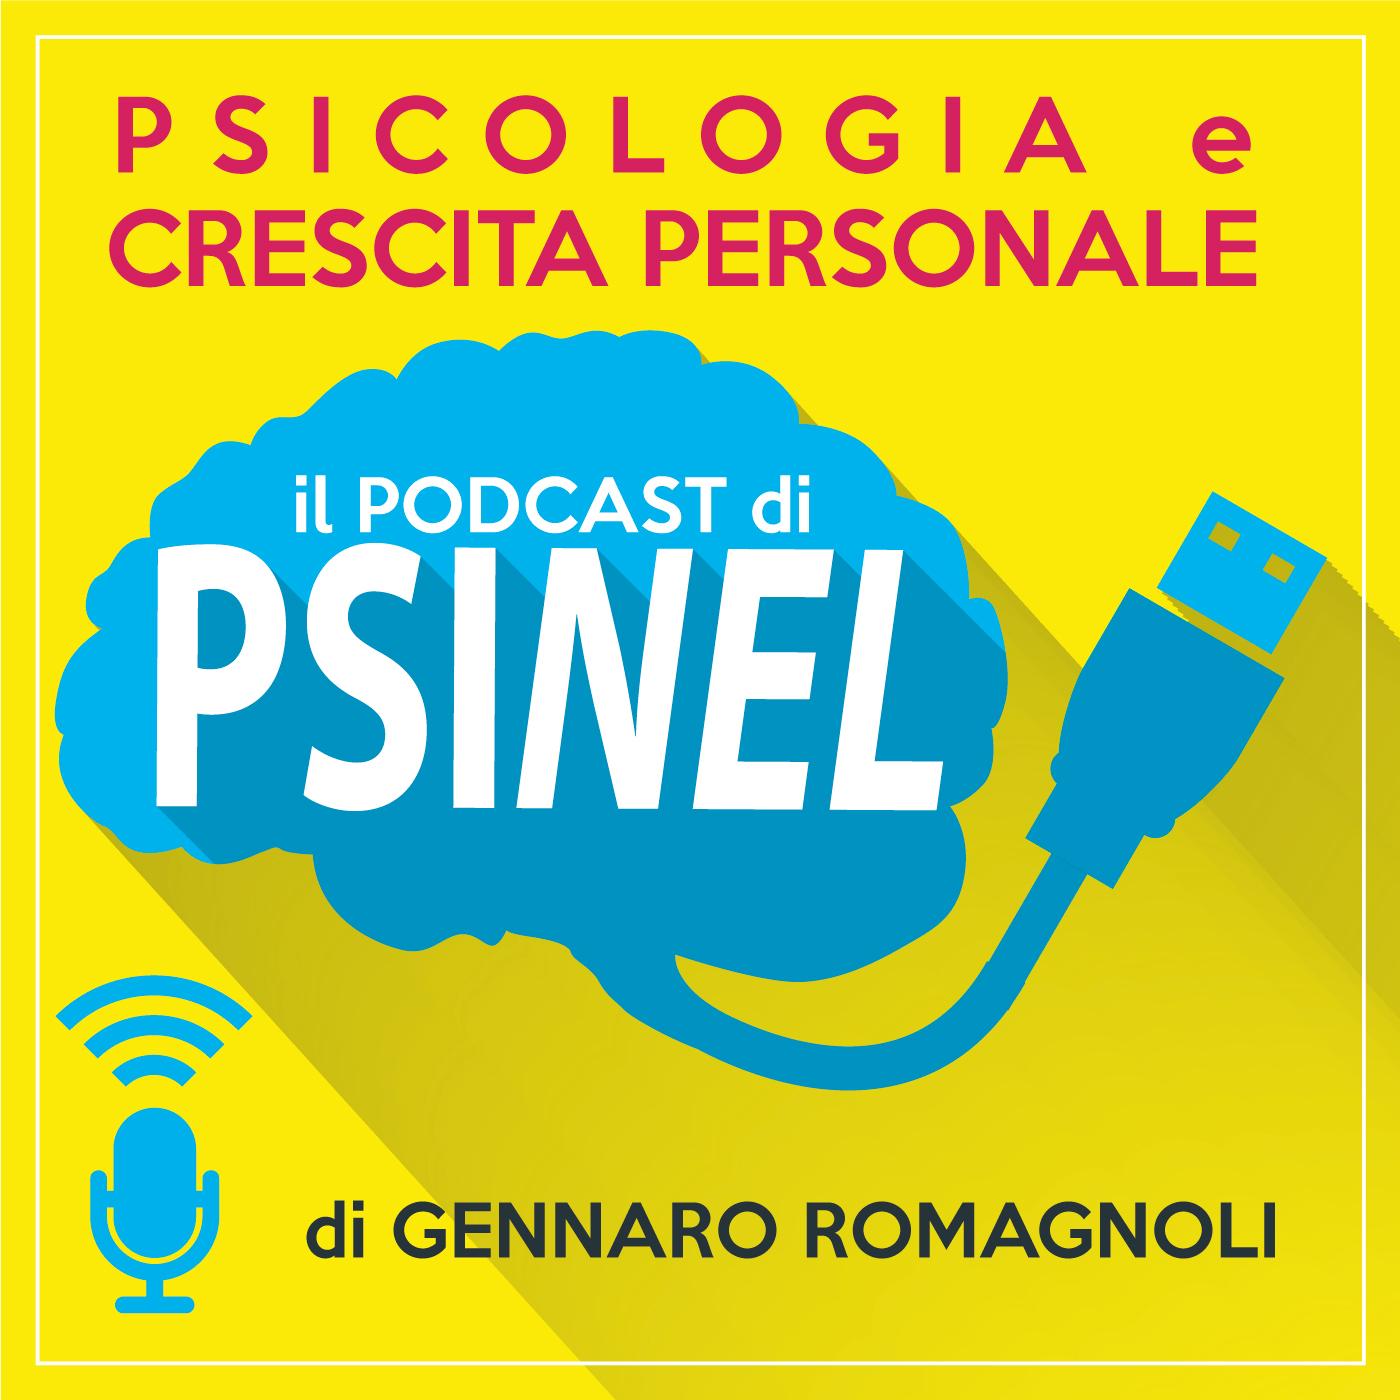 Il Podcast Di Psinel By Gennaro Romagnoli On Apple Podcasts